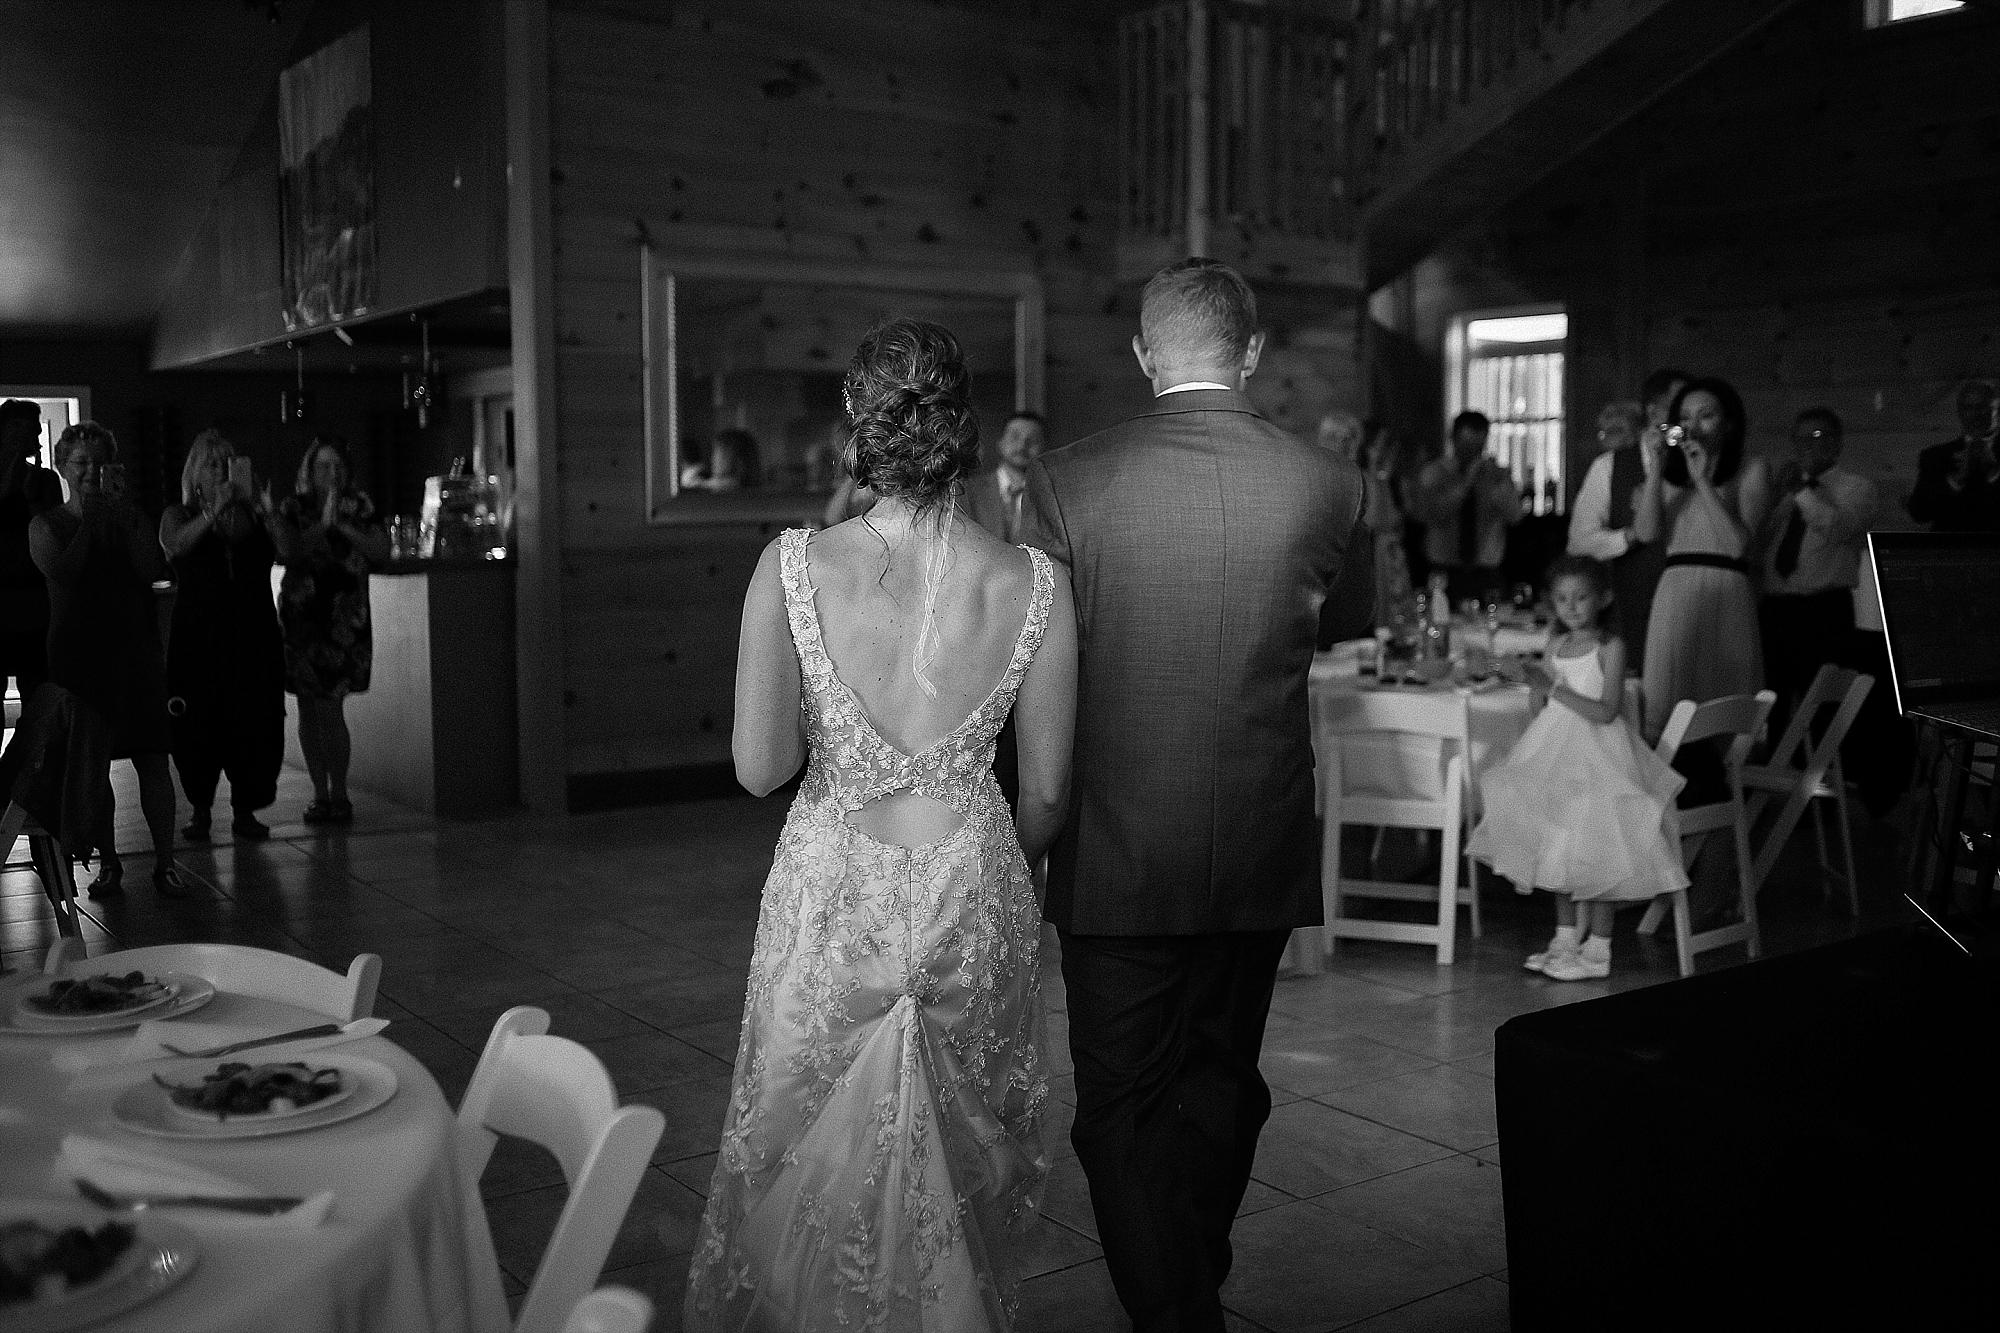 Jason + Cassie's Beliveau Estate Winery Wedding | Photo by Blacksburg, Virginia Wedding Photographer Holly Cromer